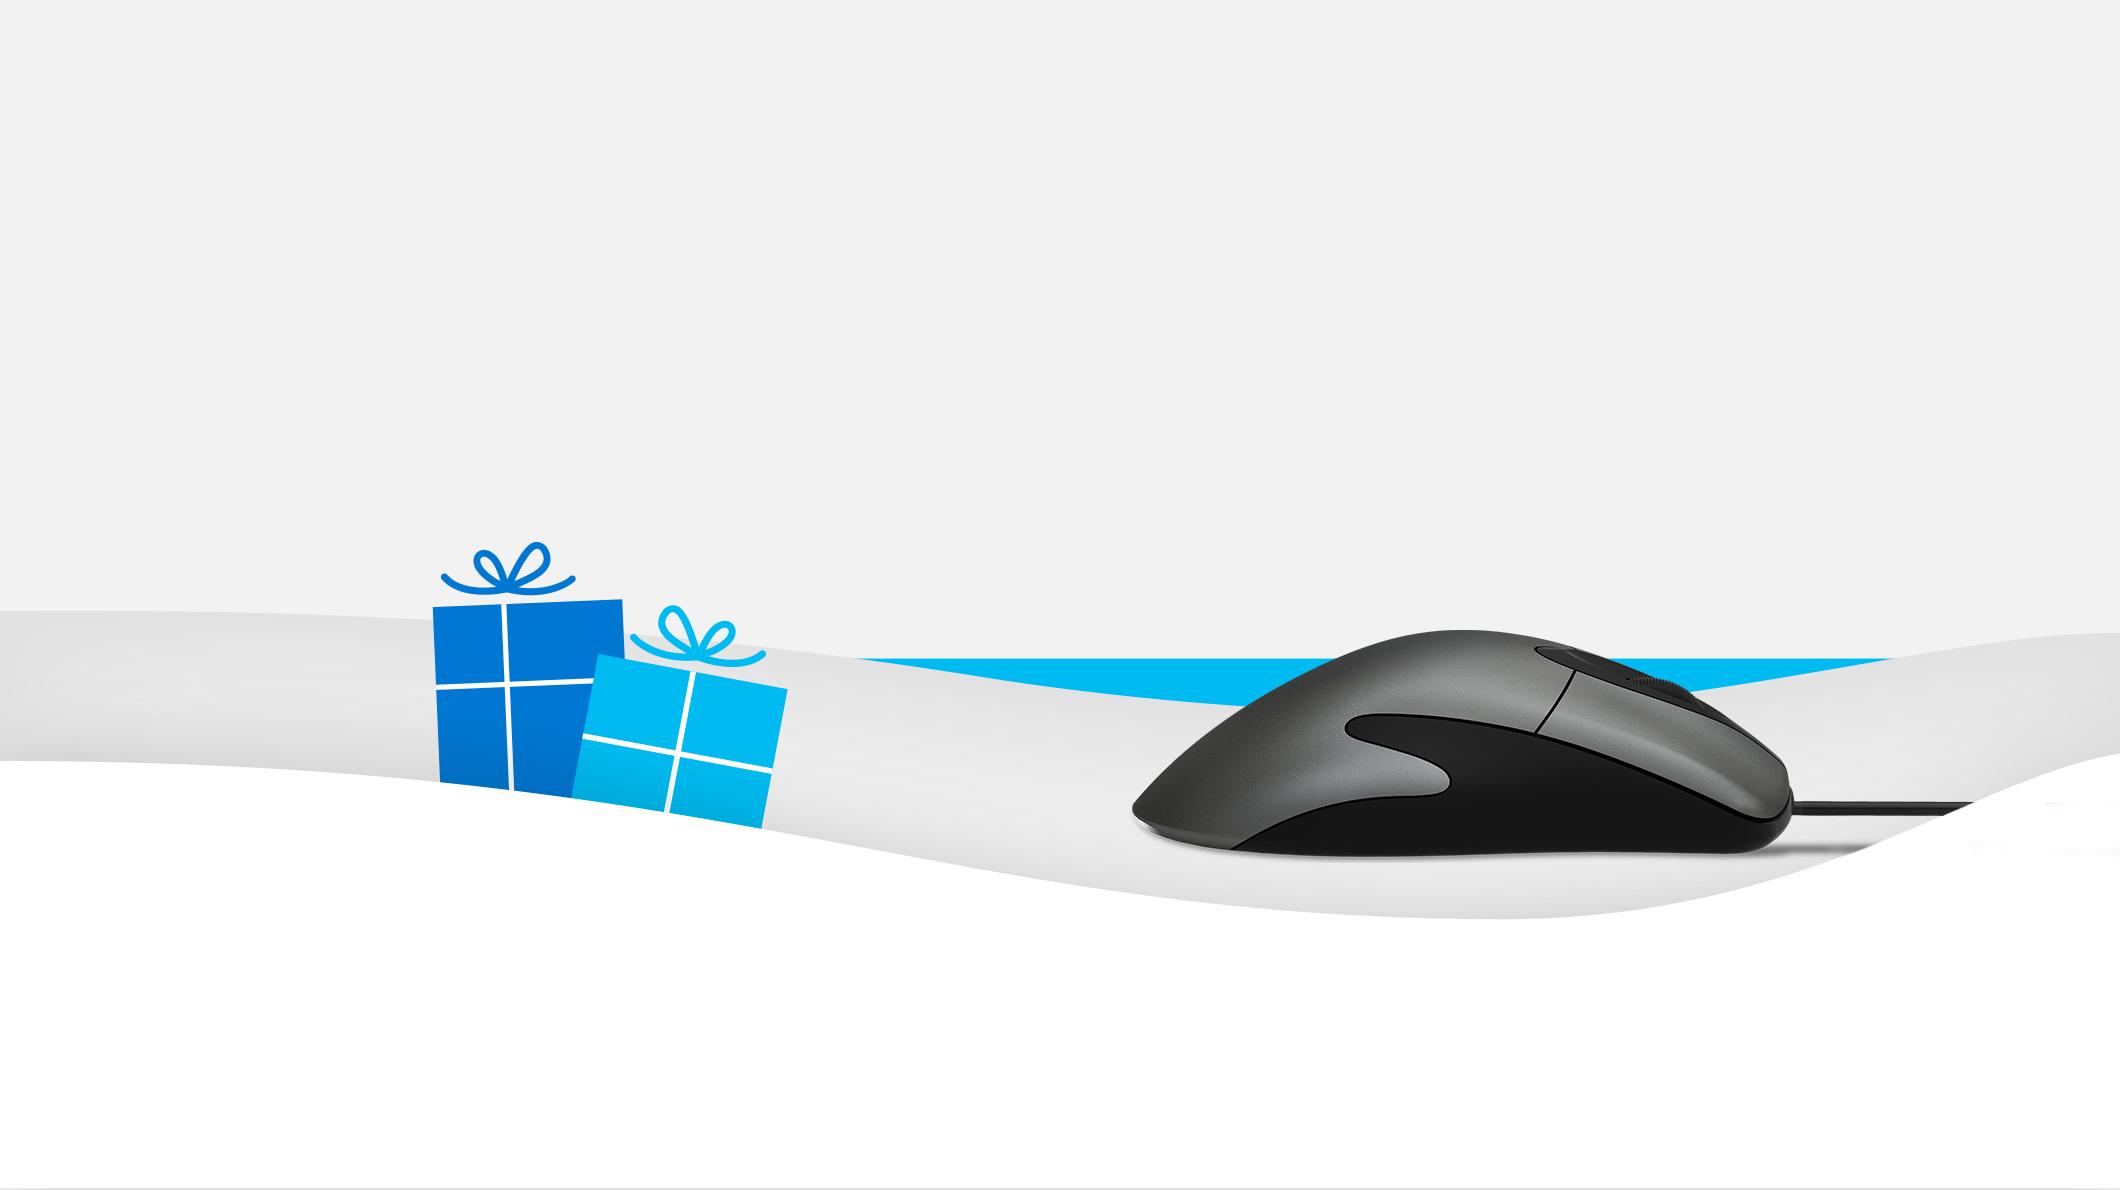 Microsoft Classic IntelliMouse